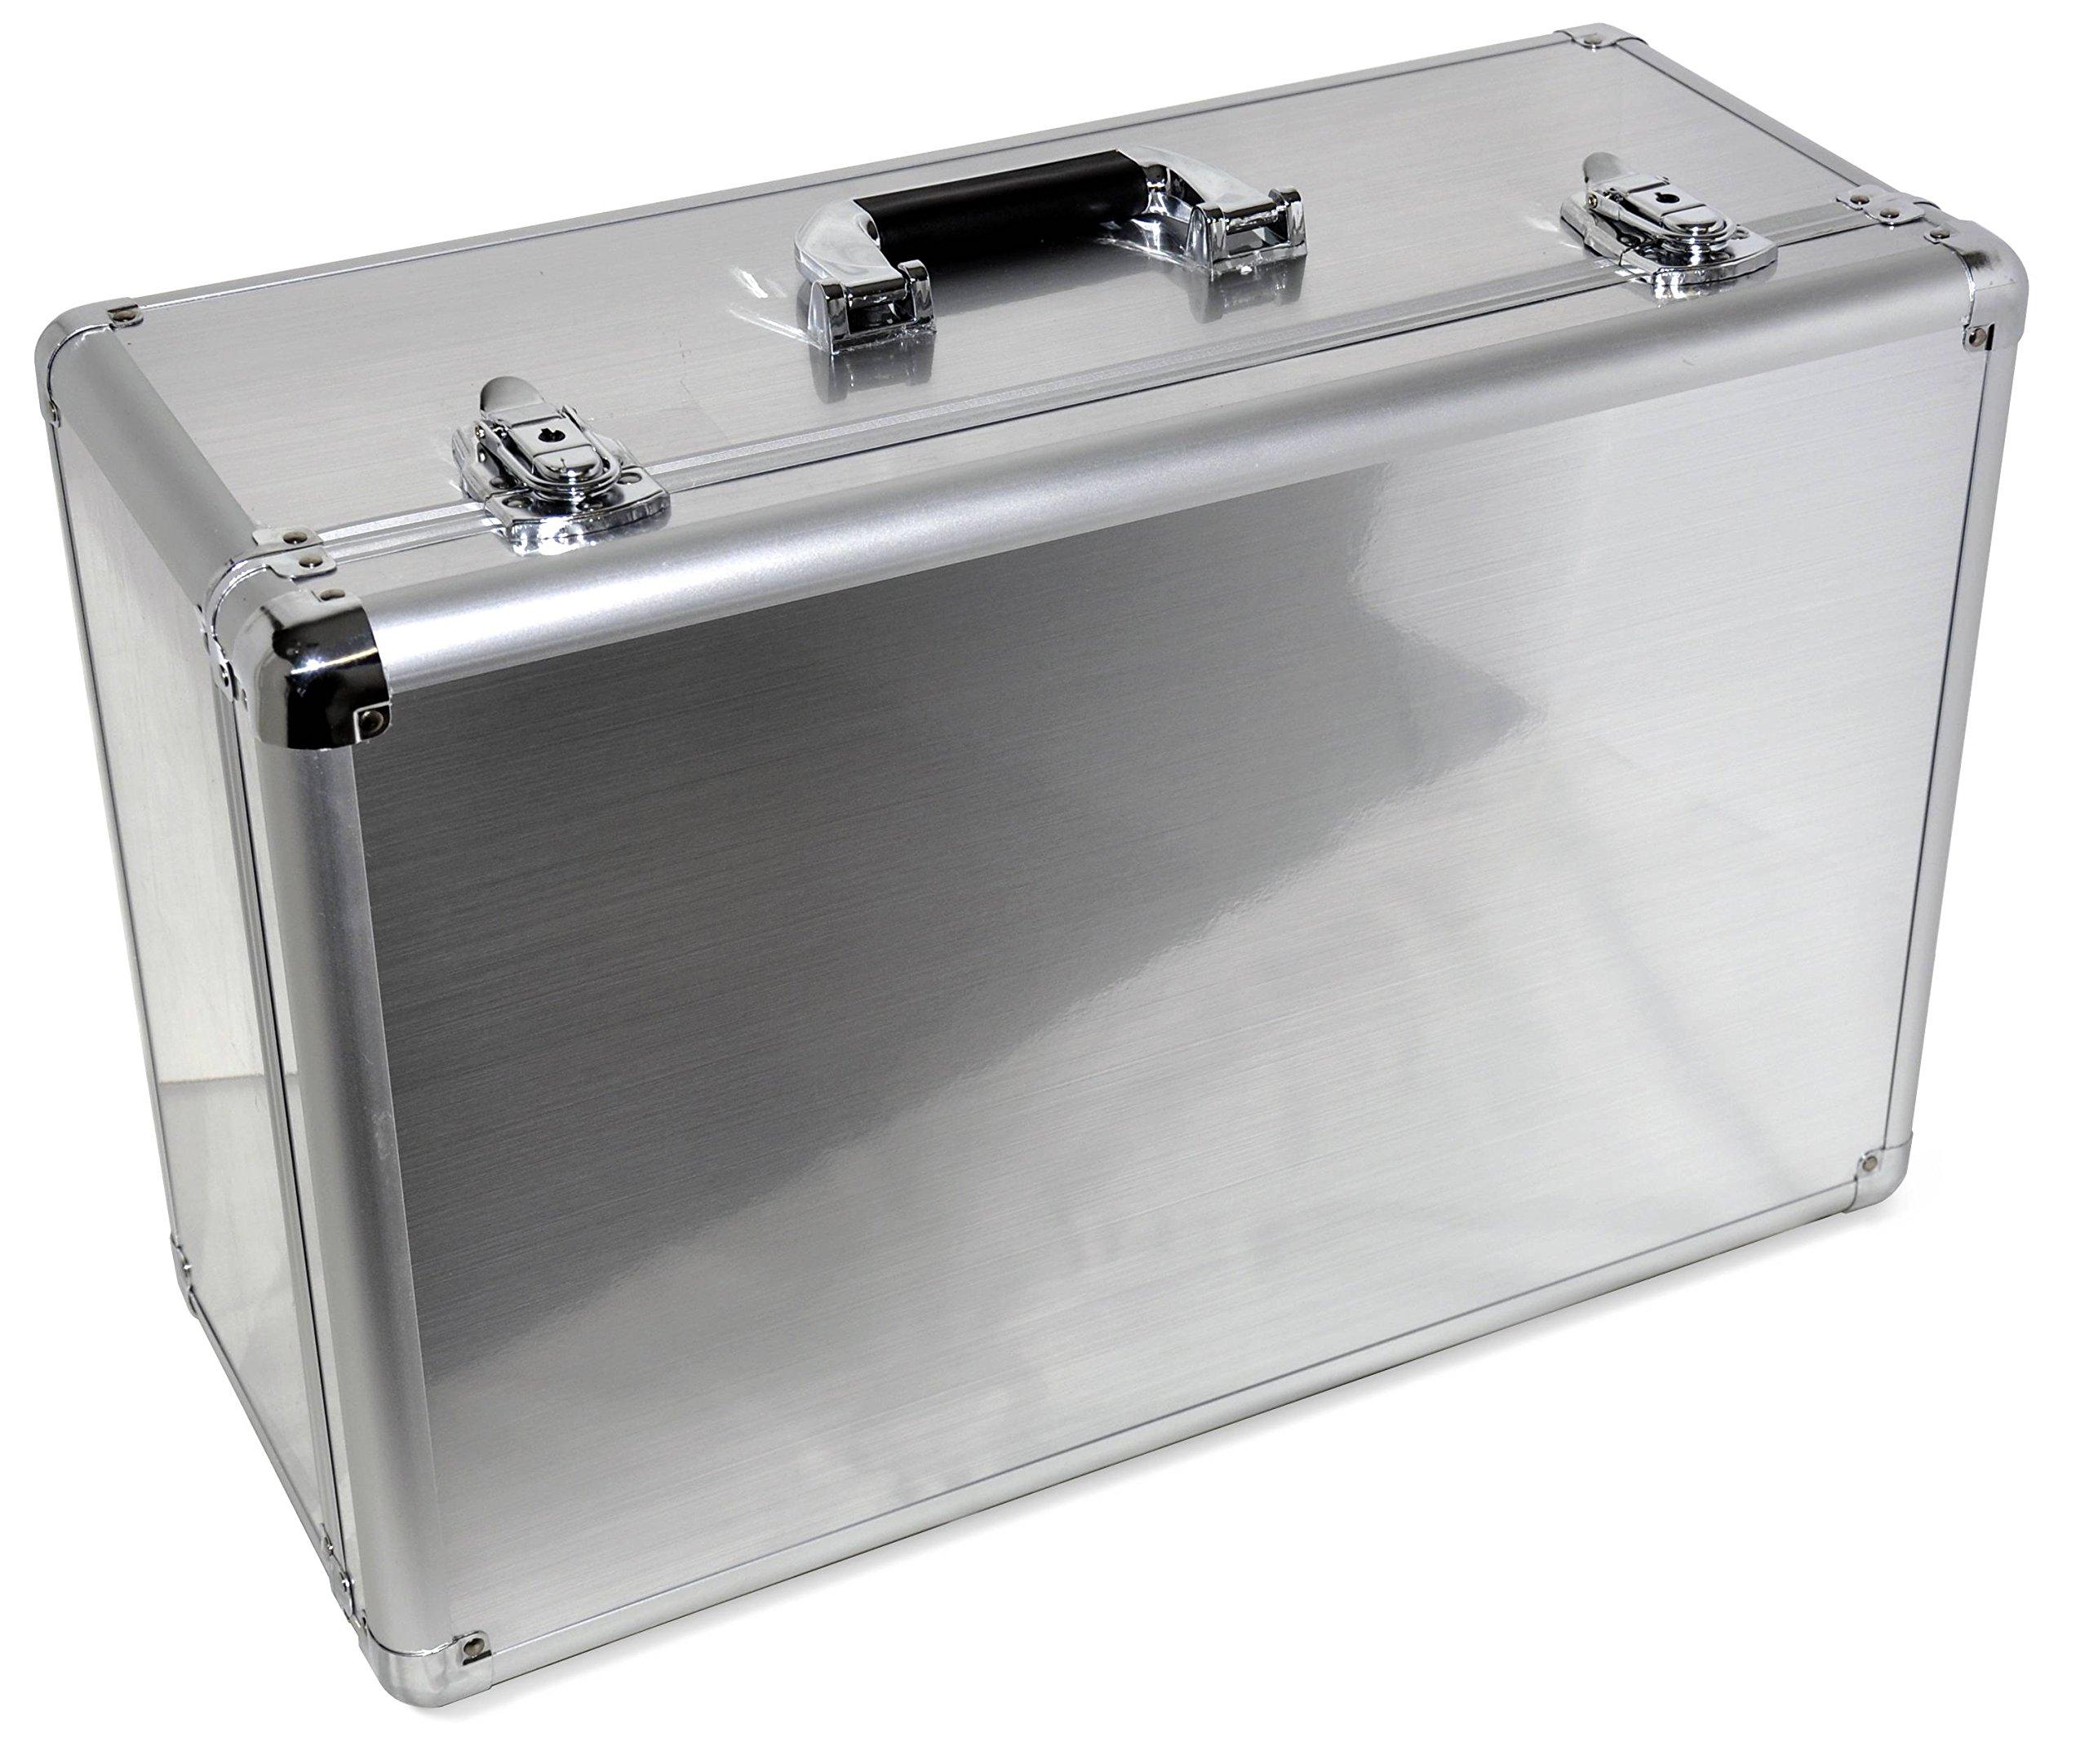 Aluminum Carrying Case DJI Phantom 4 Pro Obsidian, Phantom 4 Pro, Phantom 4 Advanced, Phantom 4, Fits Extra Accessories